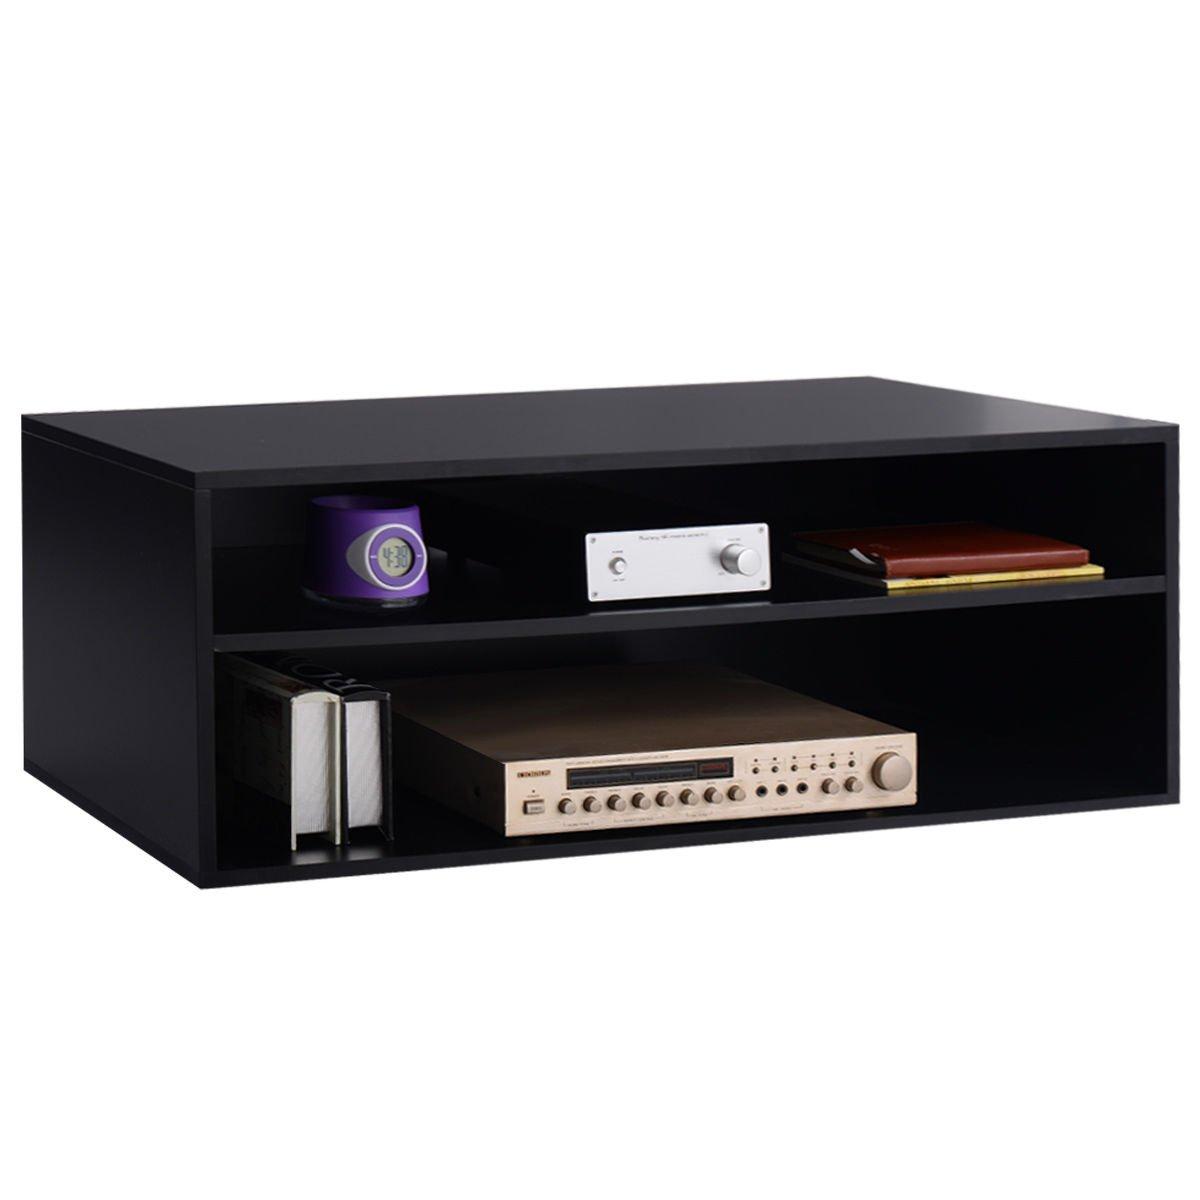 3-Tier Center Console Storage Cabinet Furniture Decor Entertainment New Black 40'' TV Stand